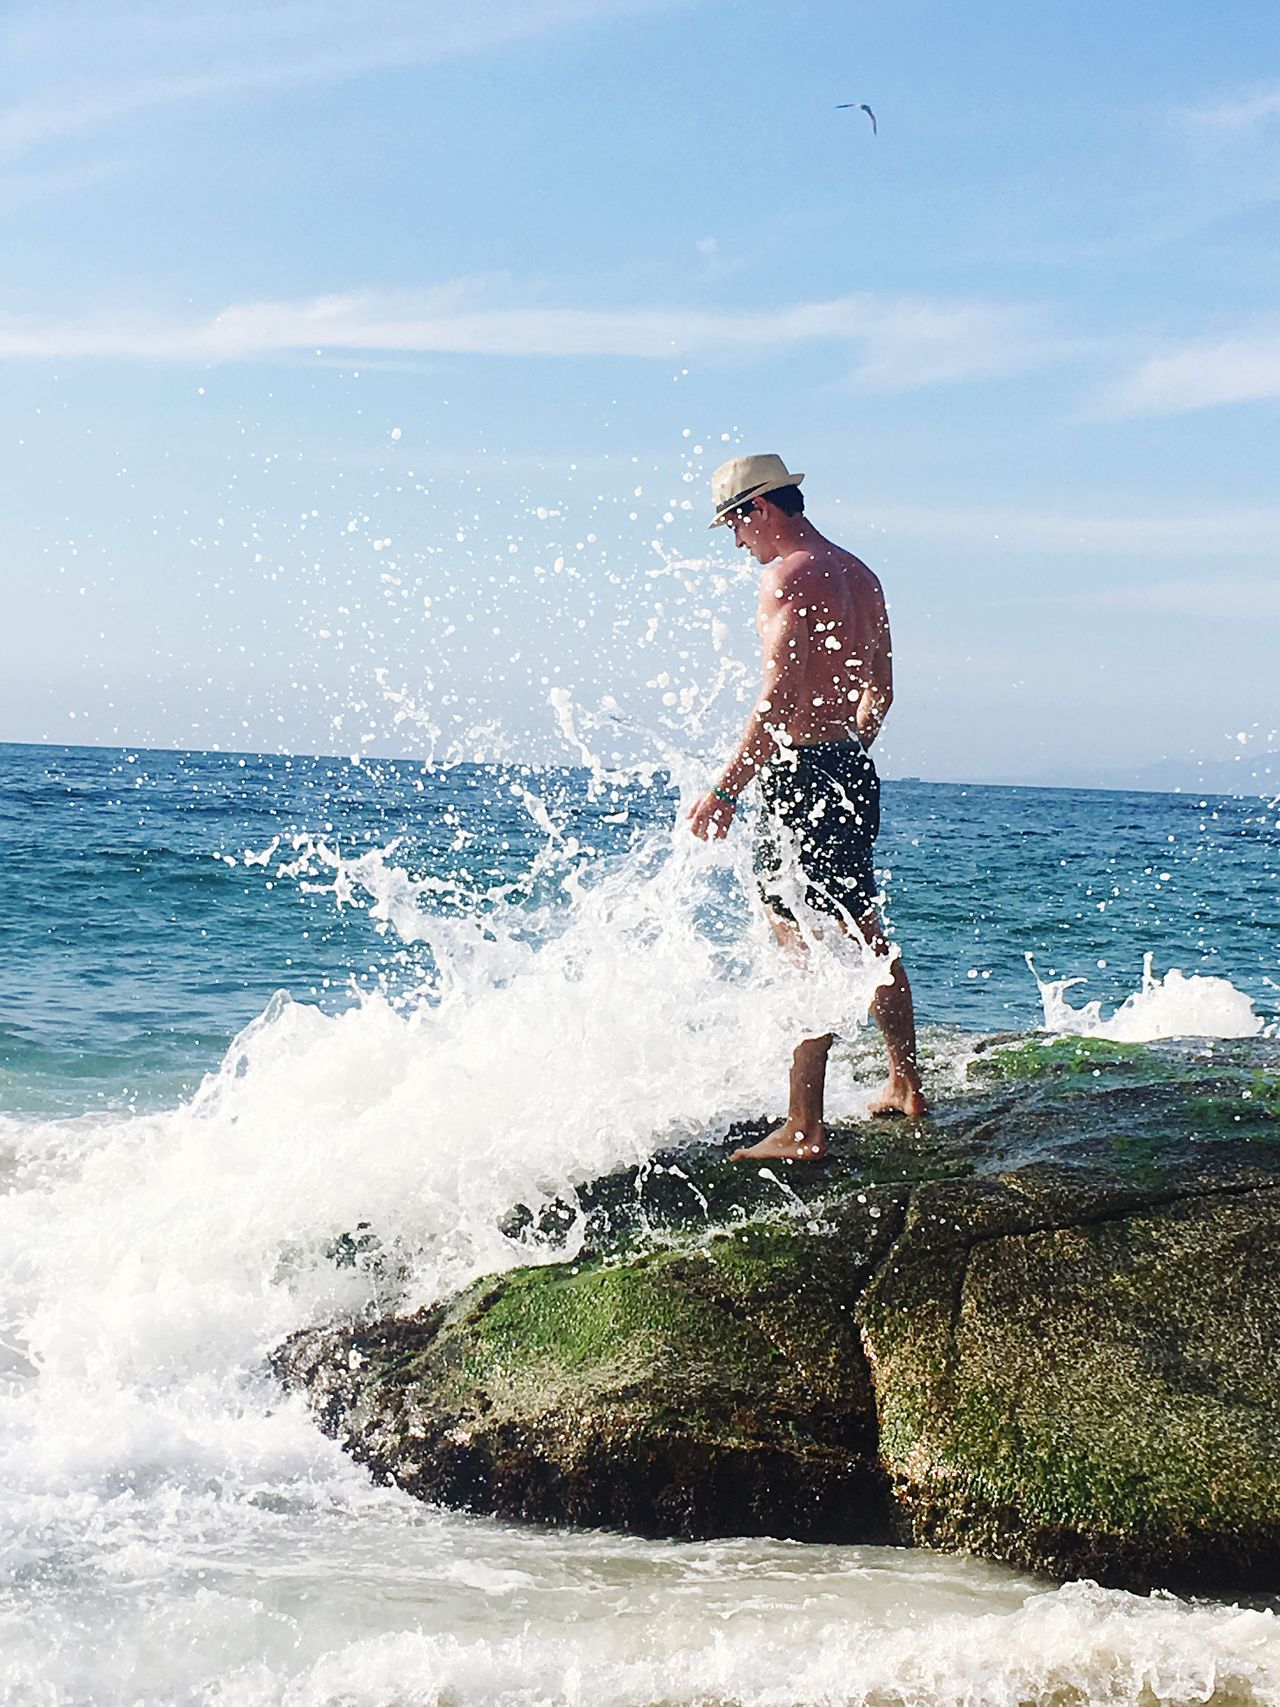 Sea Water Real People Leisure Activity Lifestyles Wave Horizon Over Water Motion One Person Day Men Splashing Rock - Object Vacations Beauty In Nature Waves, Ocean, Nature Disfrutando De La Vida